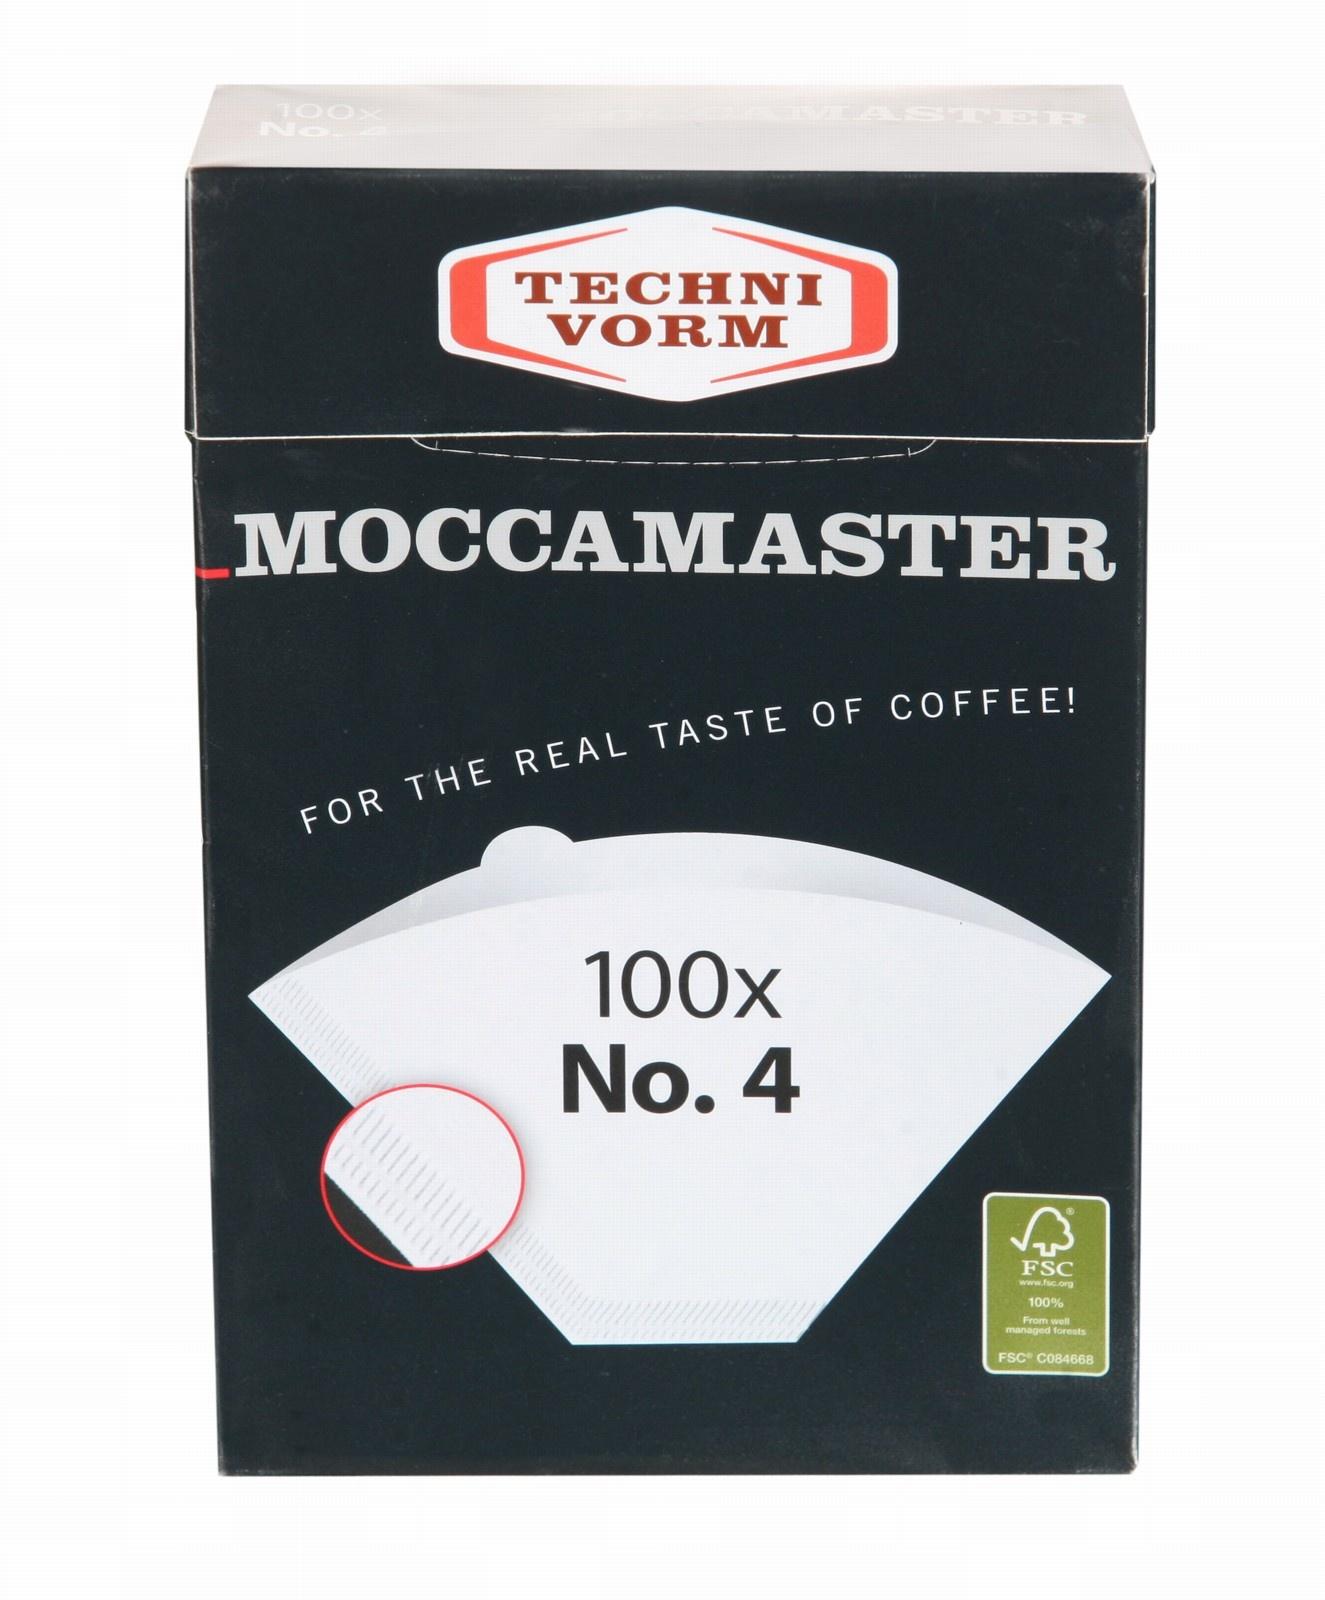 Moccamaster Moccamaster filterpapier Nr.4